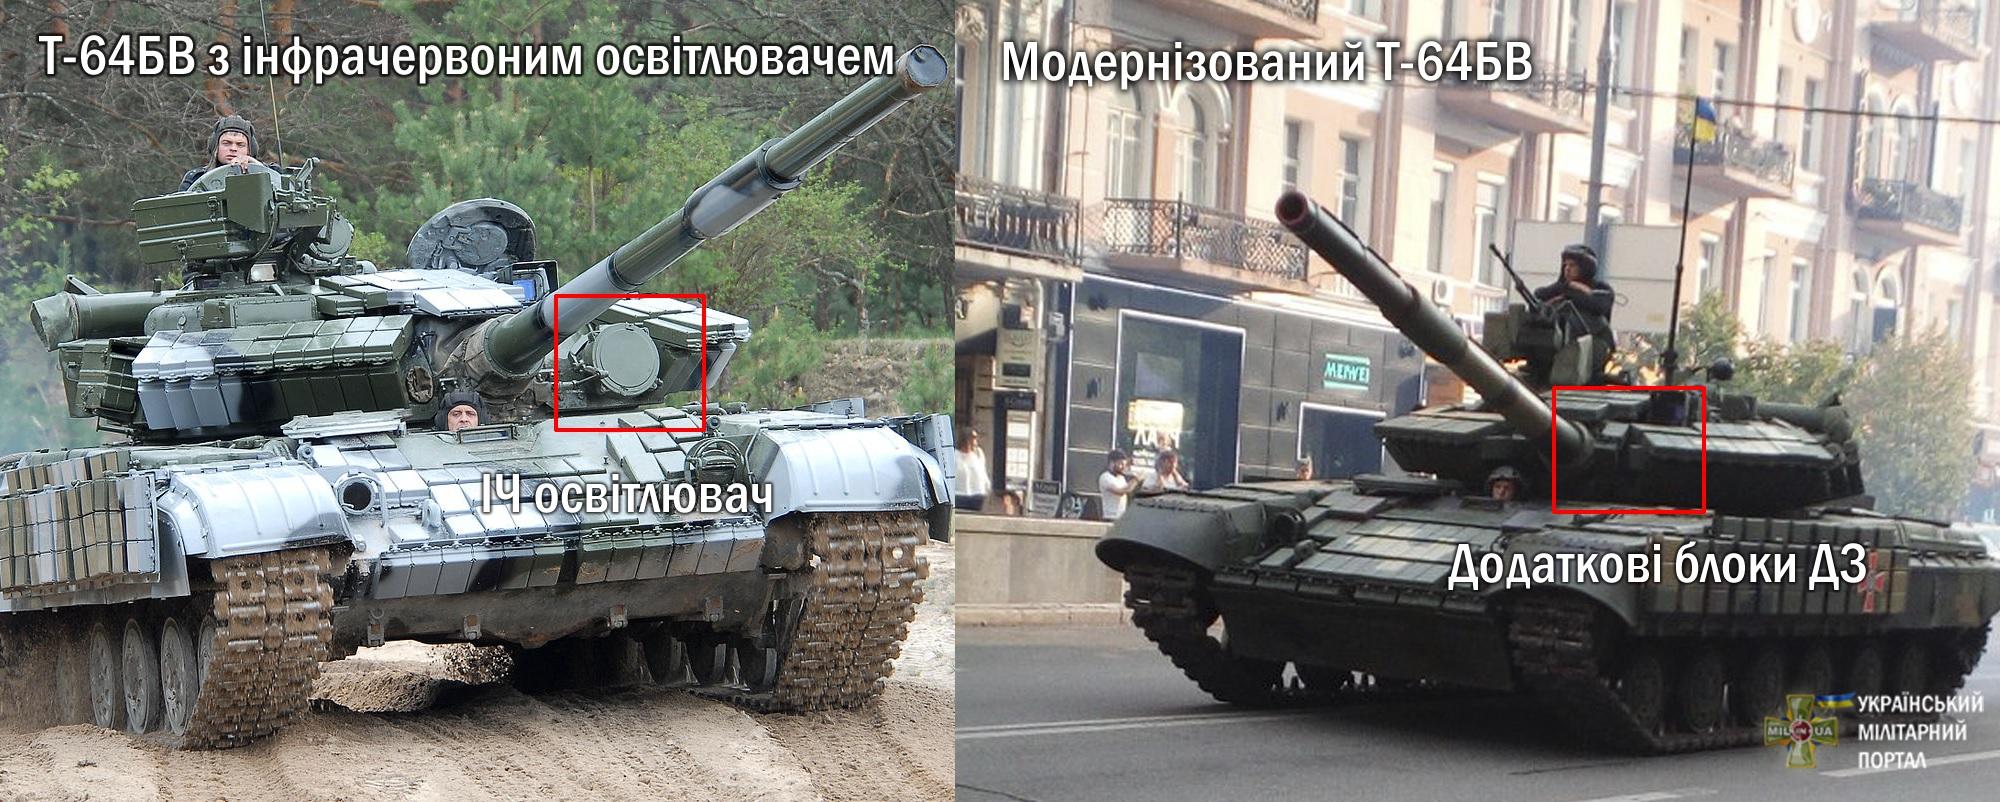 http://s5.uploads.ru/9v2Pf.jpg